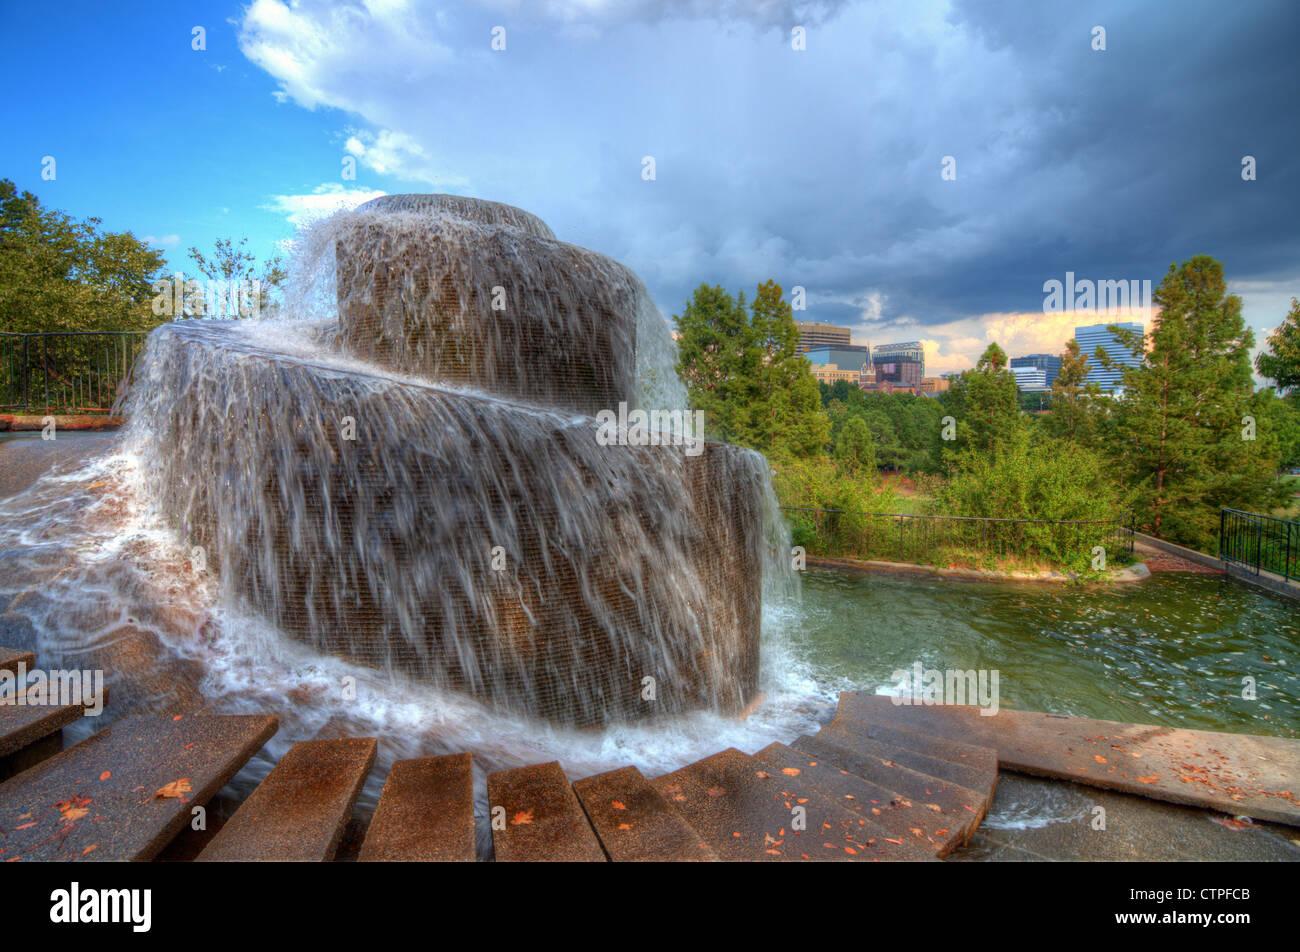 Finlay Park Fountain in Columbia, South Carolina, USA - Stock Image